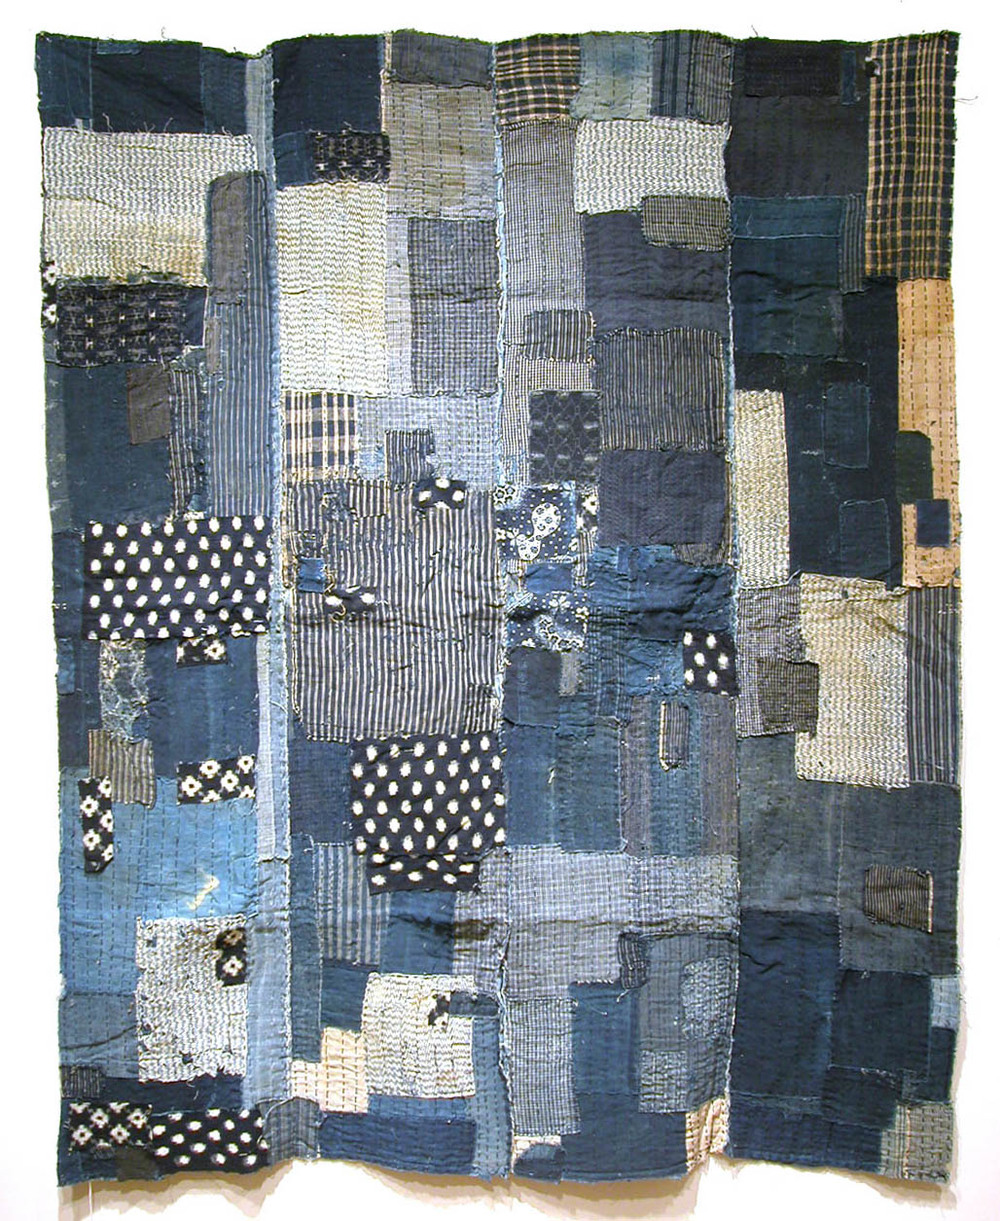 Japanese Textiles Boro, Futon Cover Lining, Futonji, Pre-WWII Sashiko stitching/patchwork 62.5 x 50.5 in / 158.8 x 128.3 cm / JTex 32